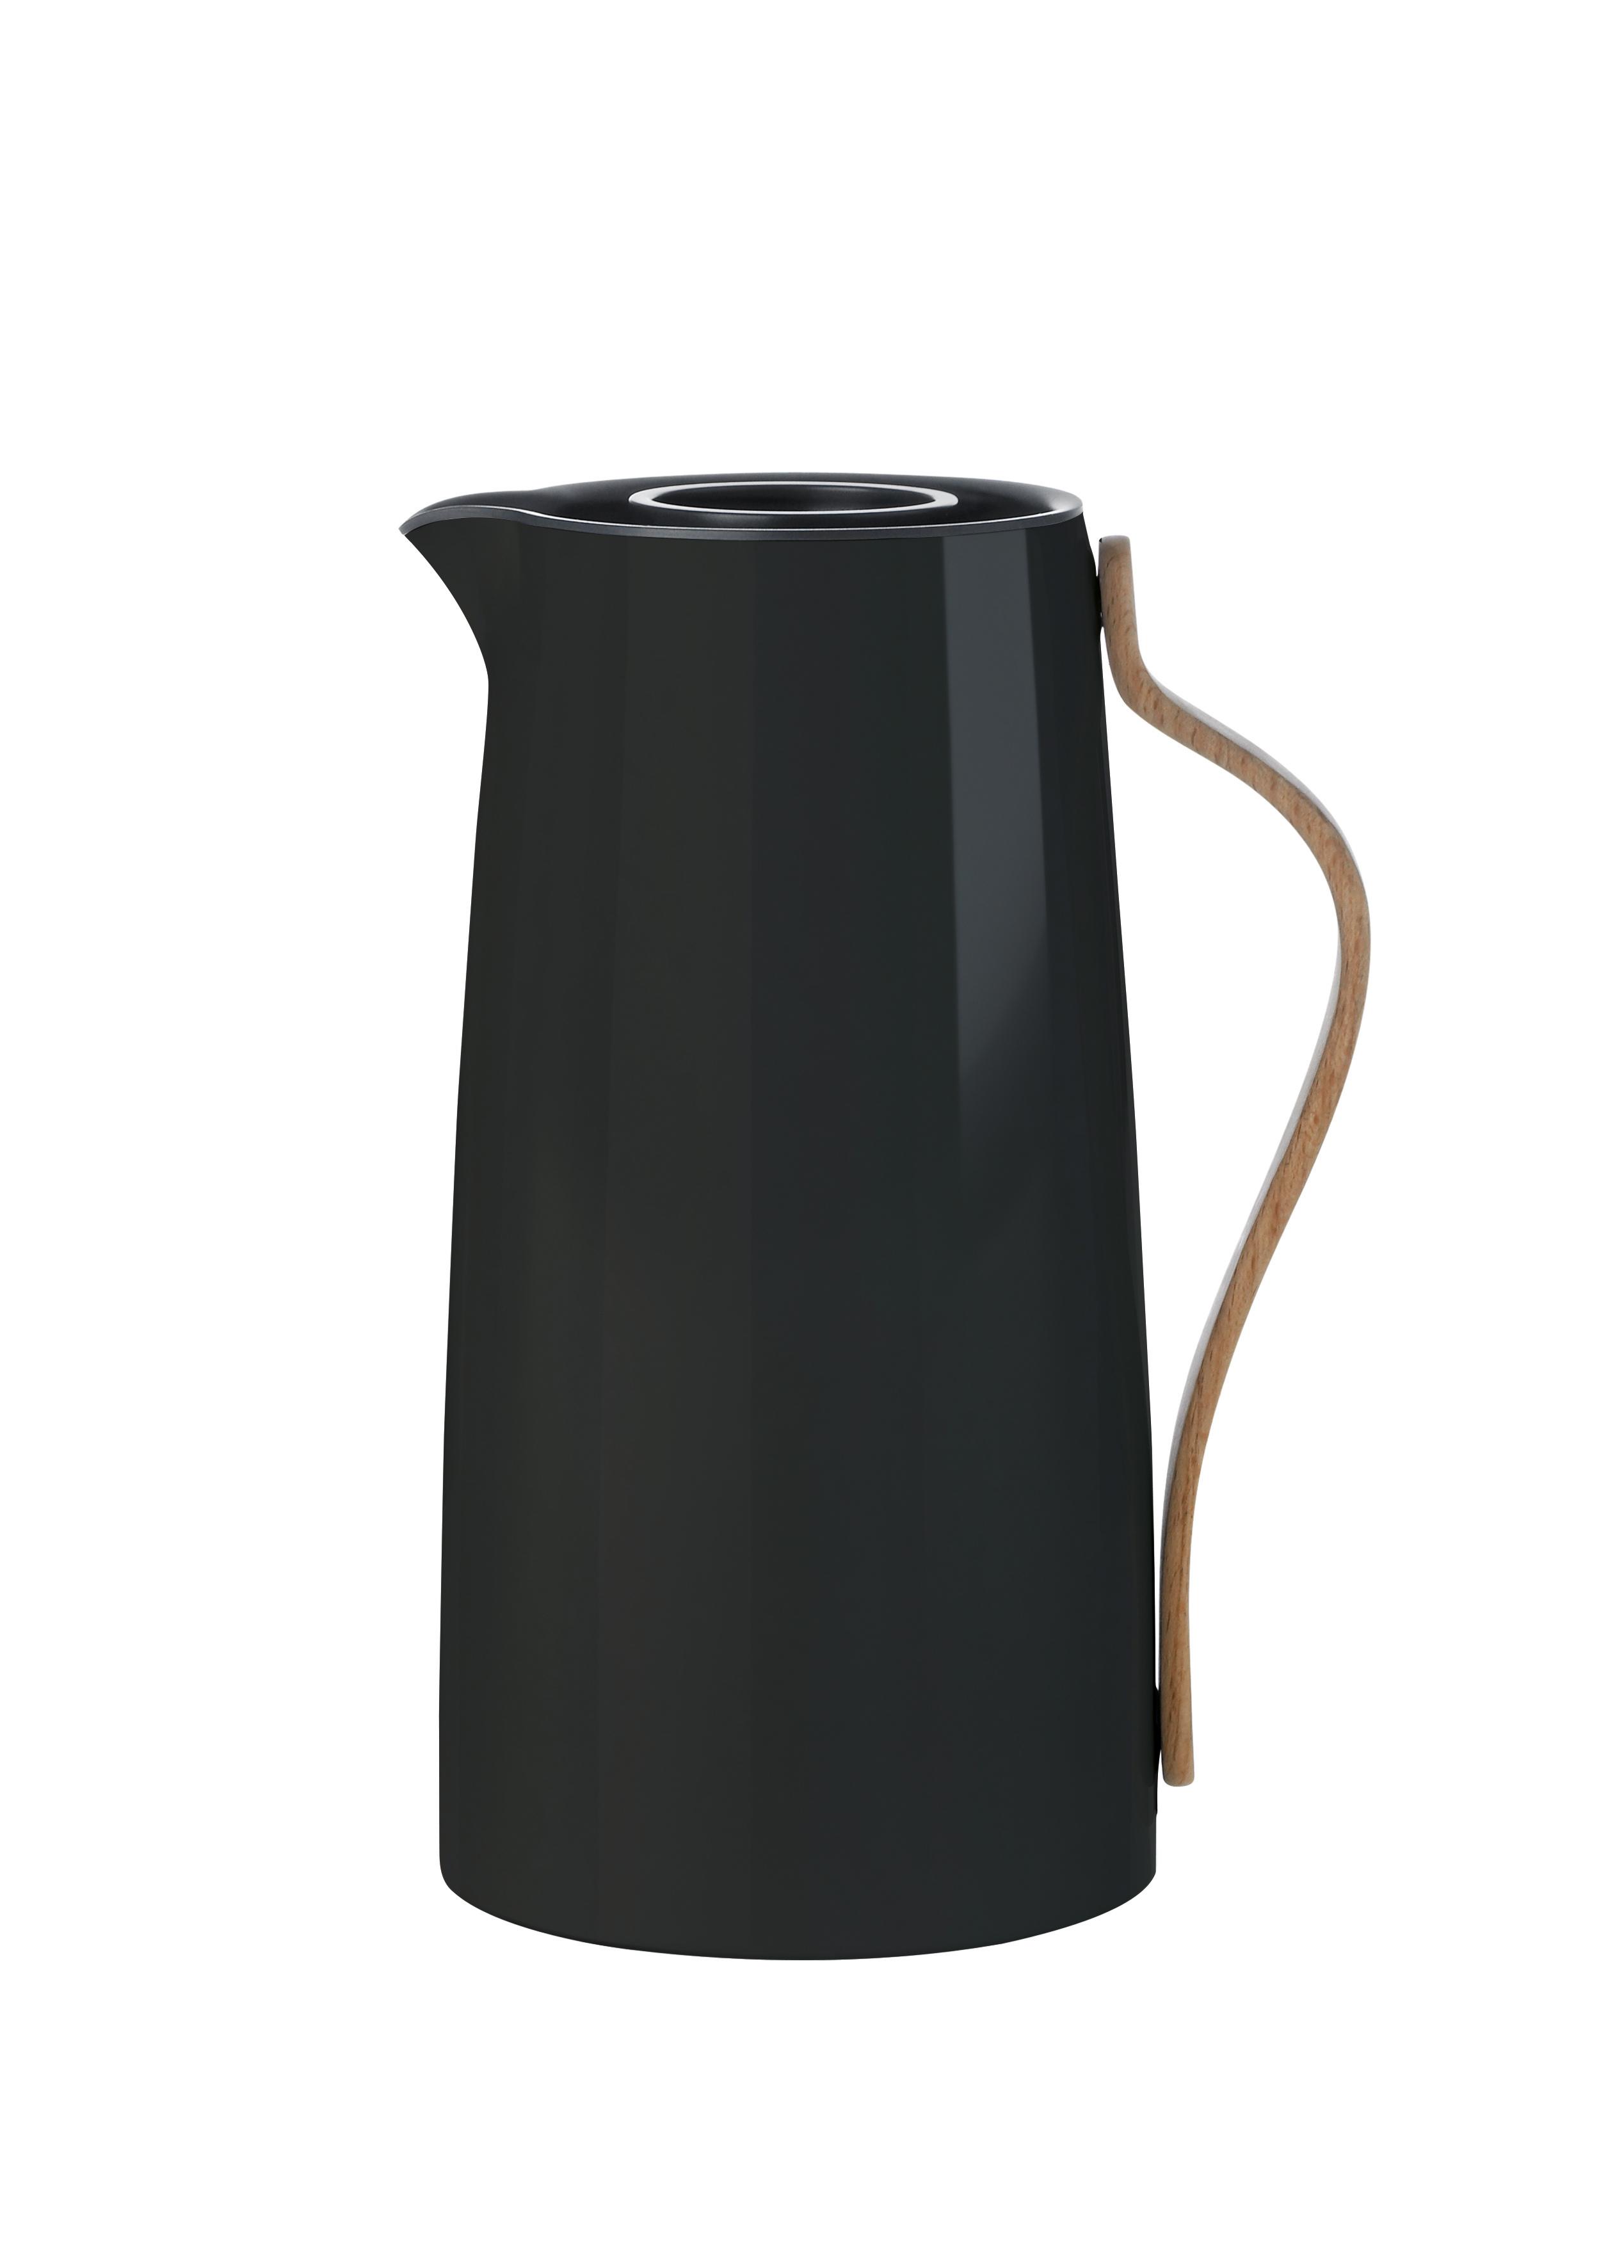 Stelton - Emma Coffee Thermo 1,2 L - Black (x-200-2)